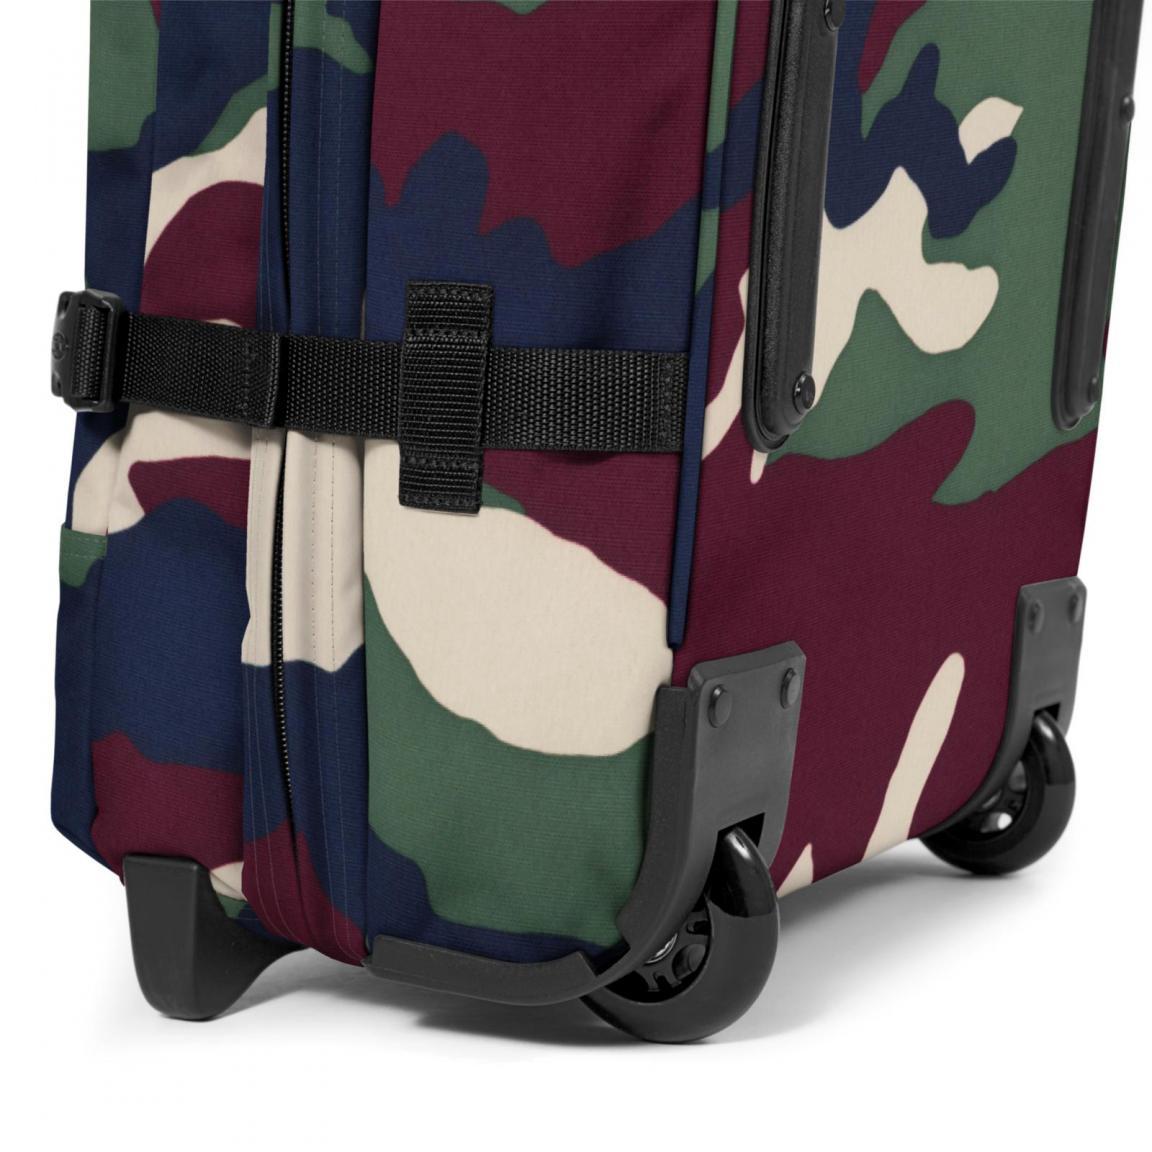 1bda60fc61573 Eastpak TranverzL Koffertasche Camo Green Camoflage Rot - Bags   more